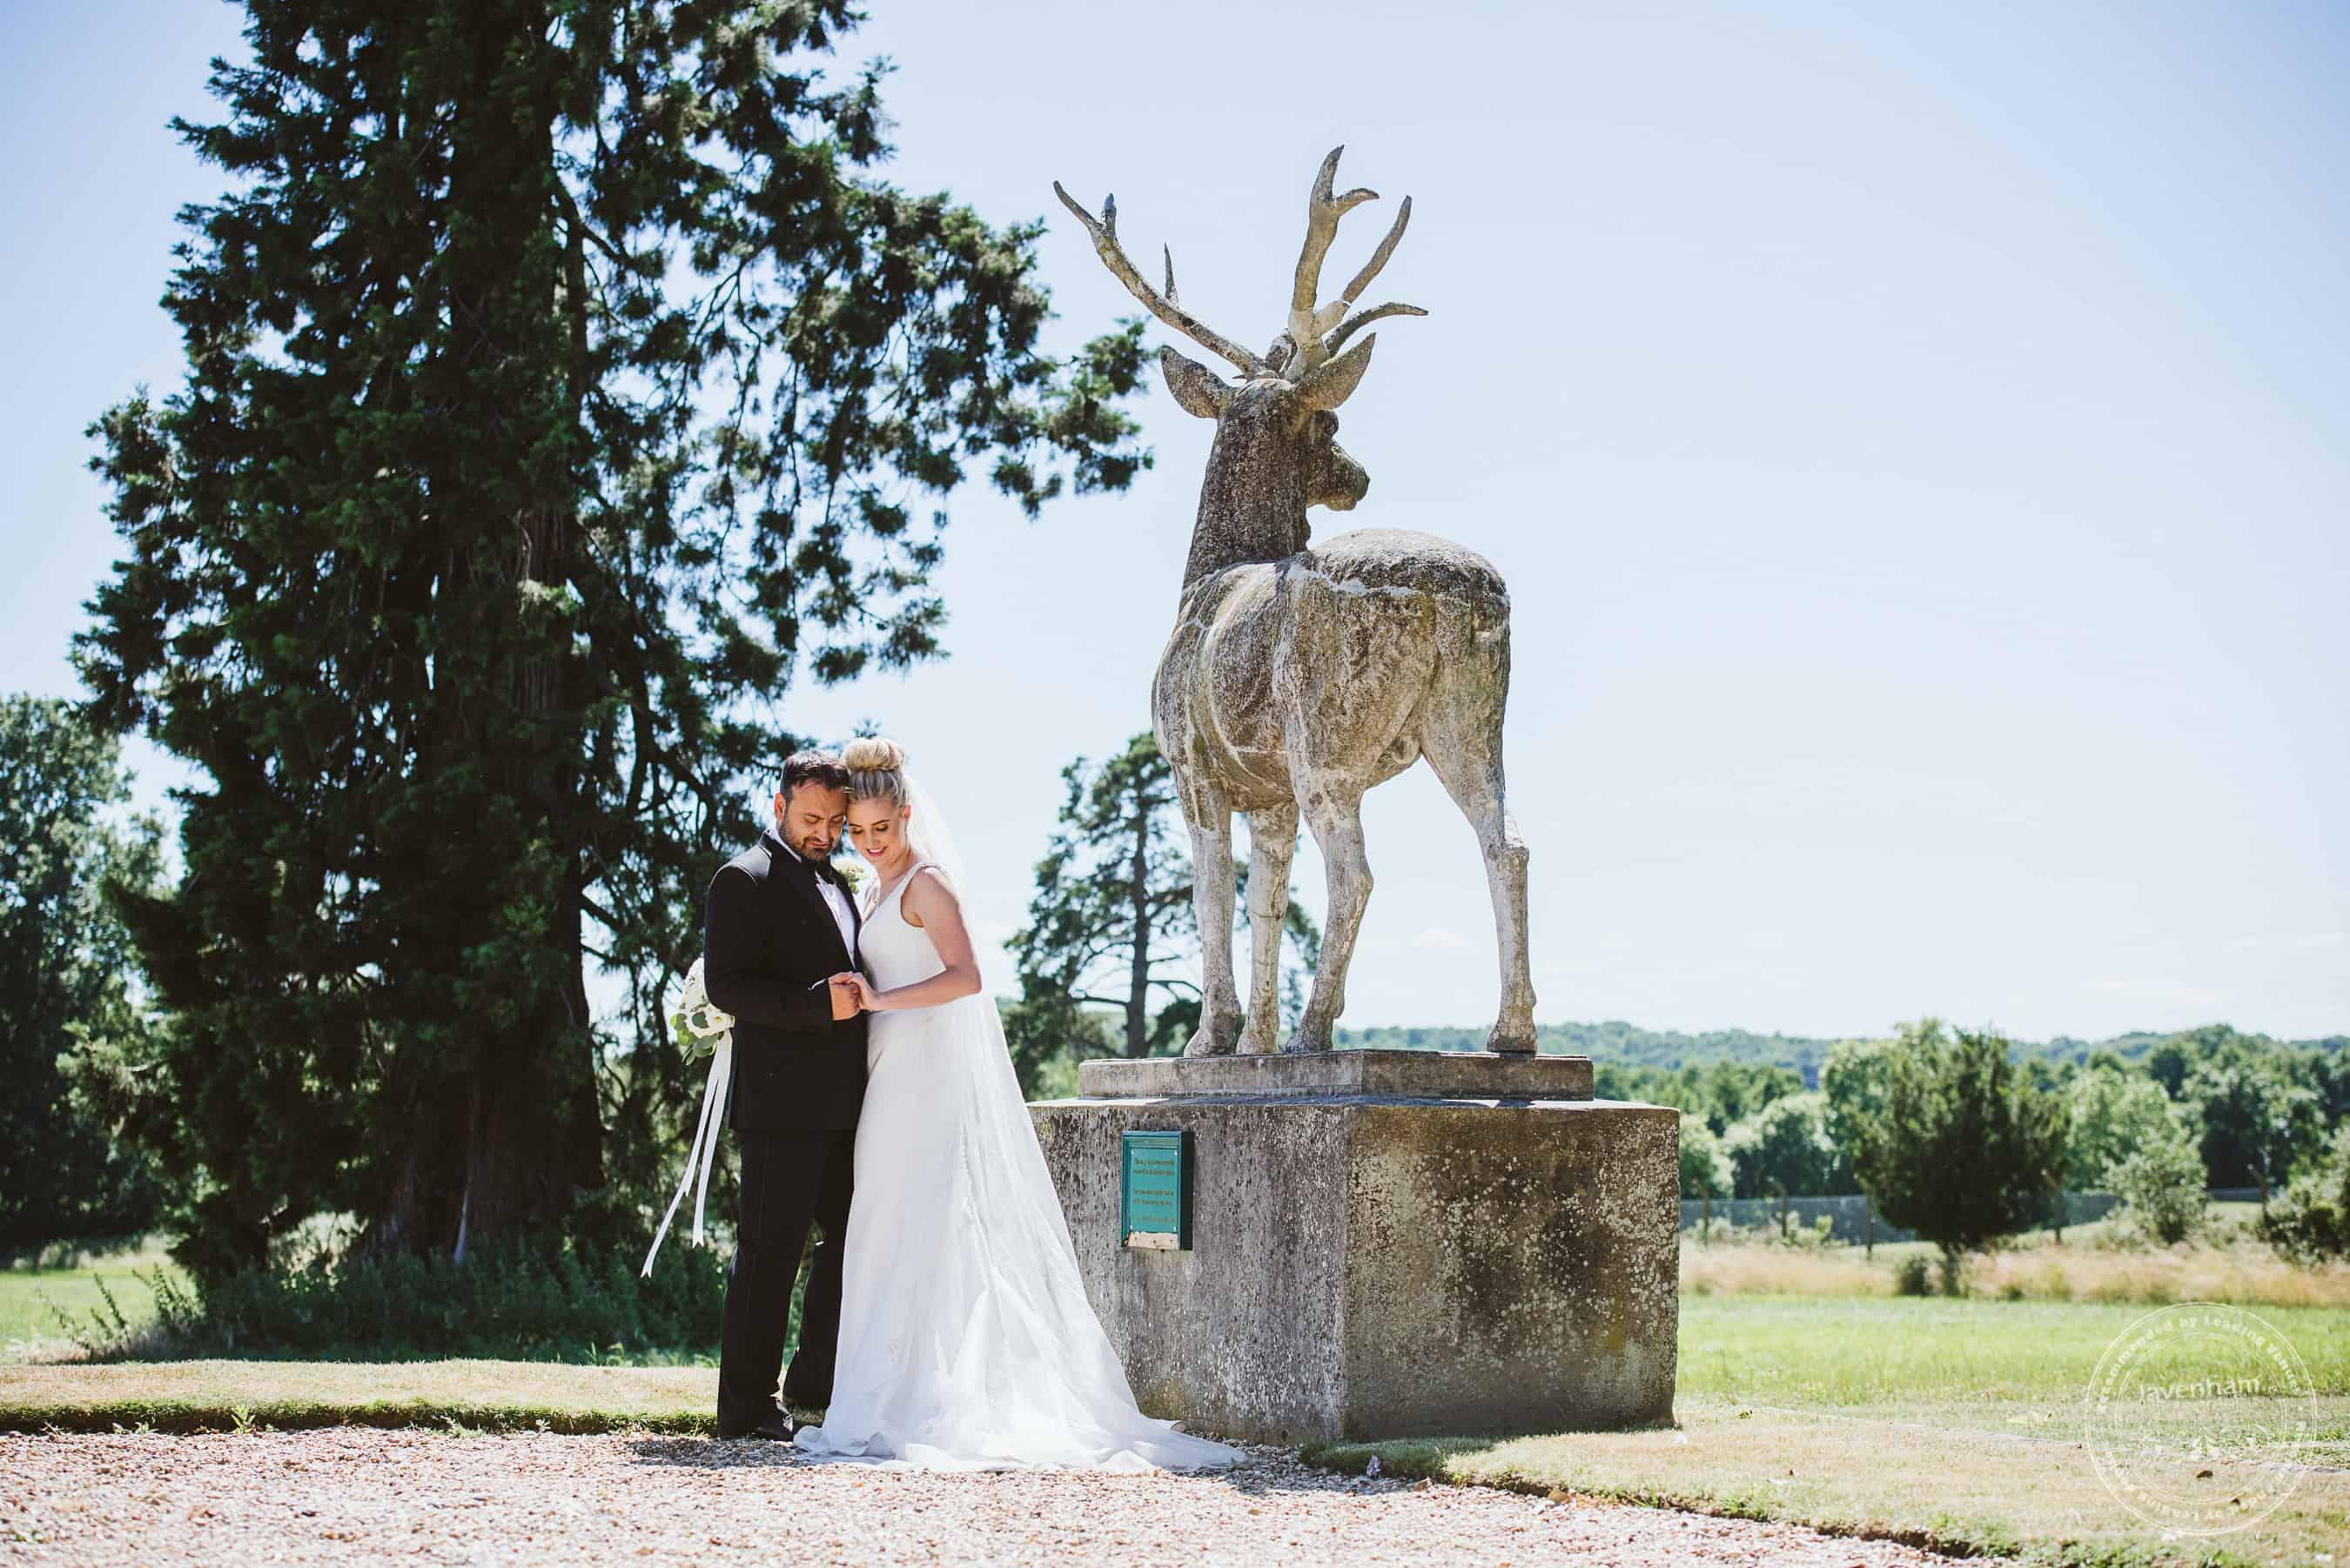 220618 Gosfield Hall Wedding Photography Lavenham Photographic 0127